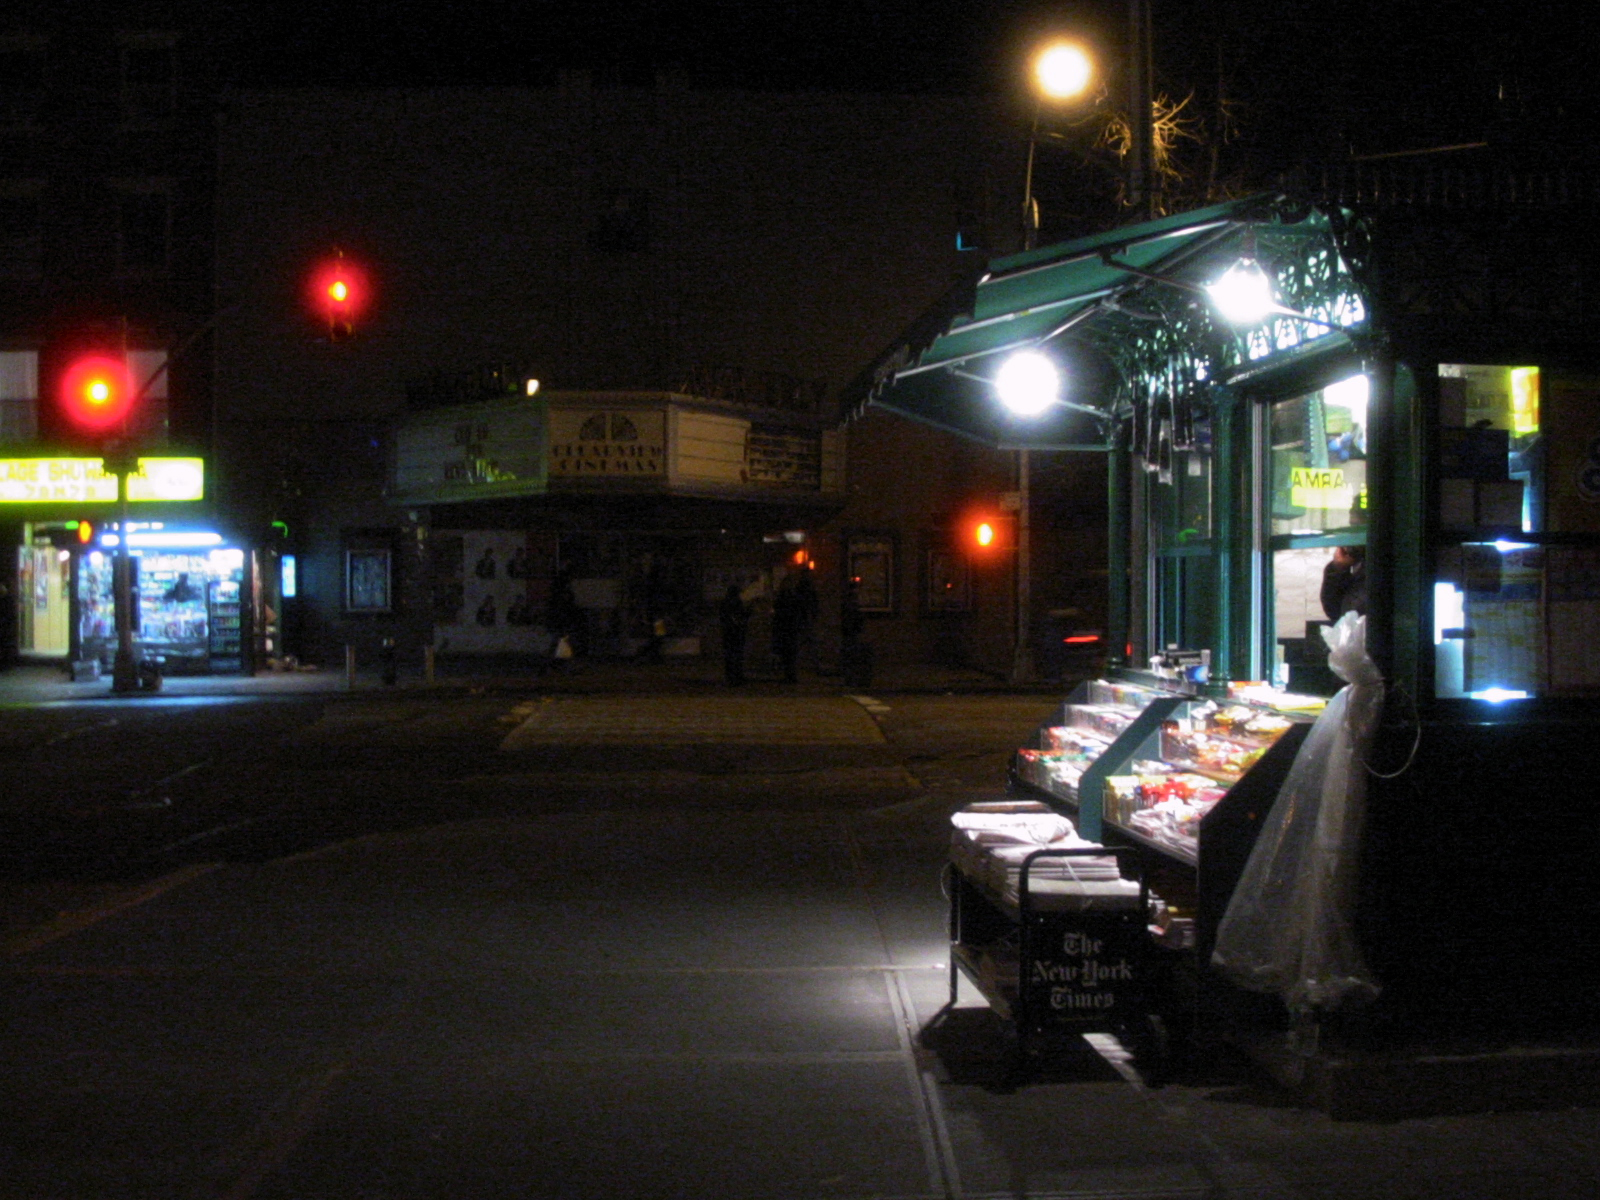 W. 3rd street, New York City